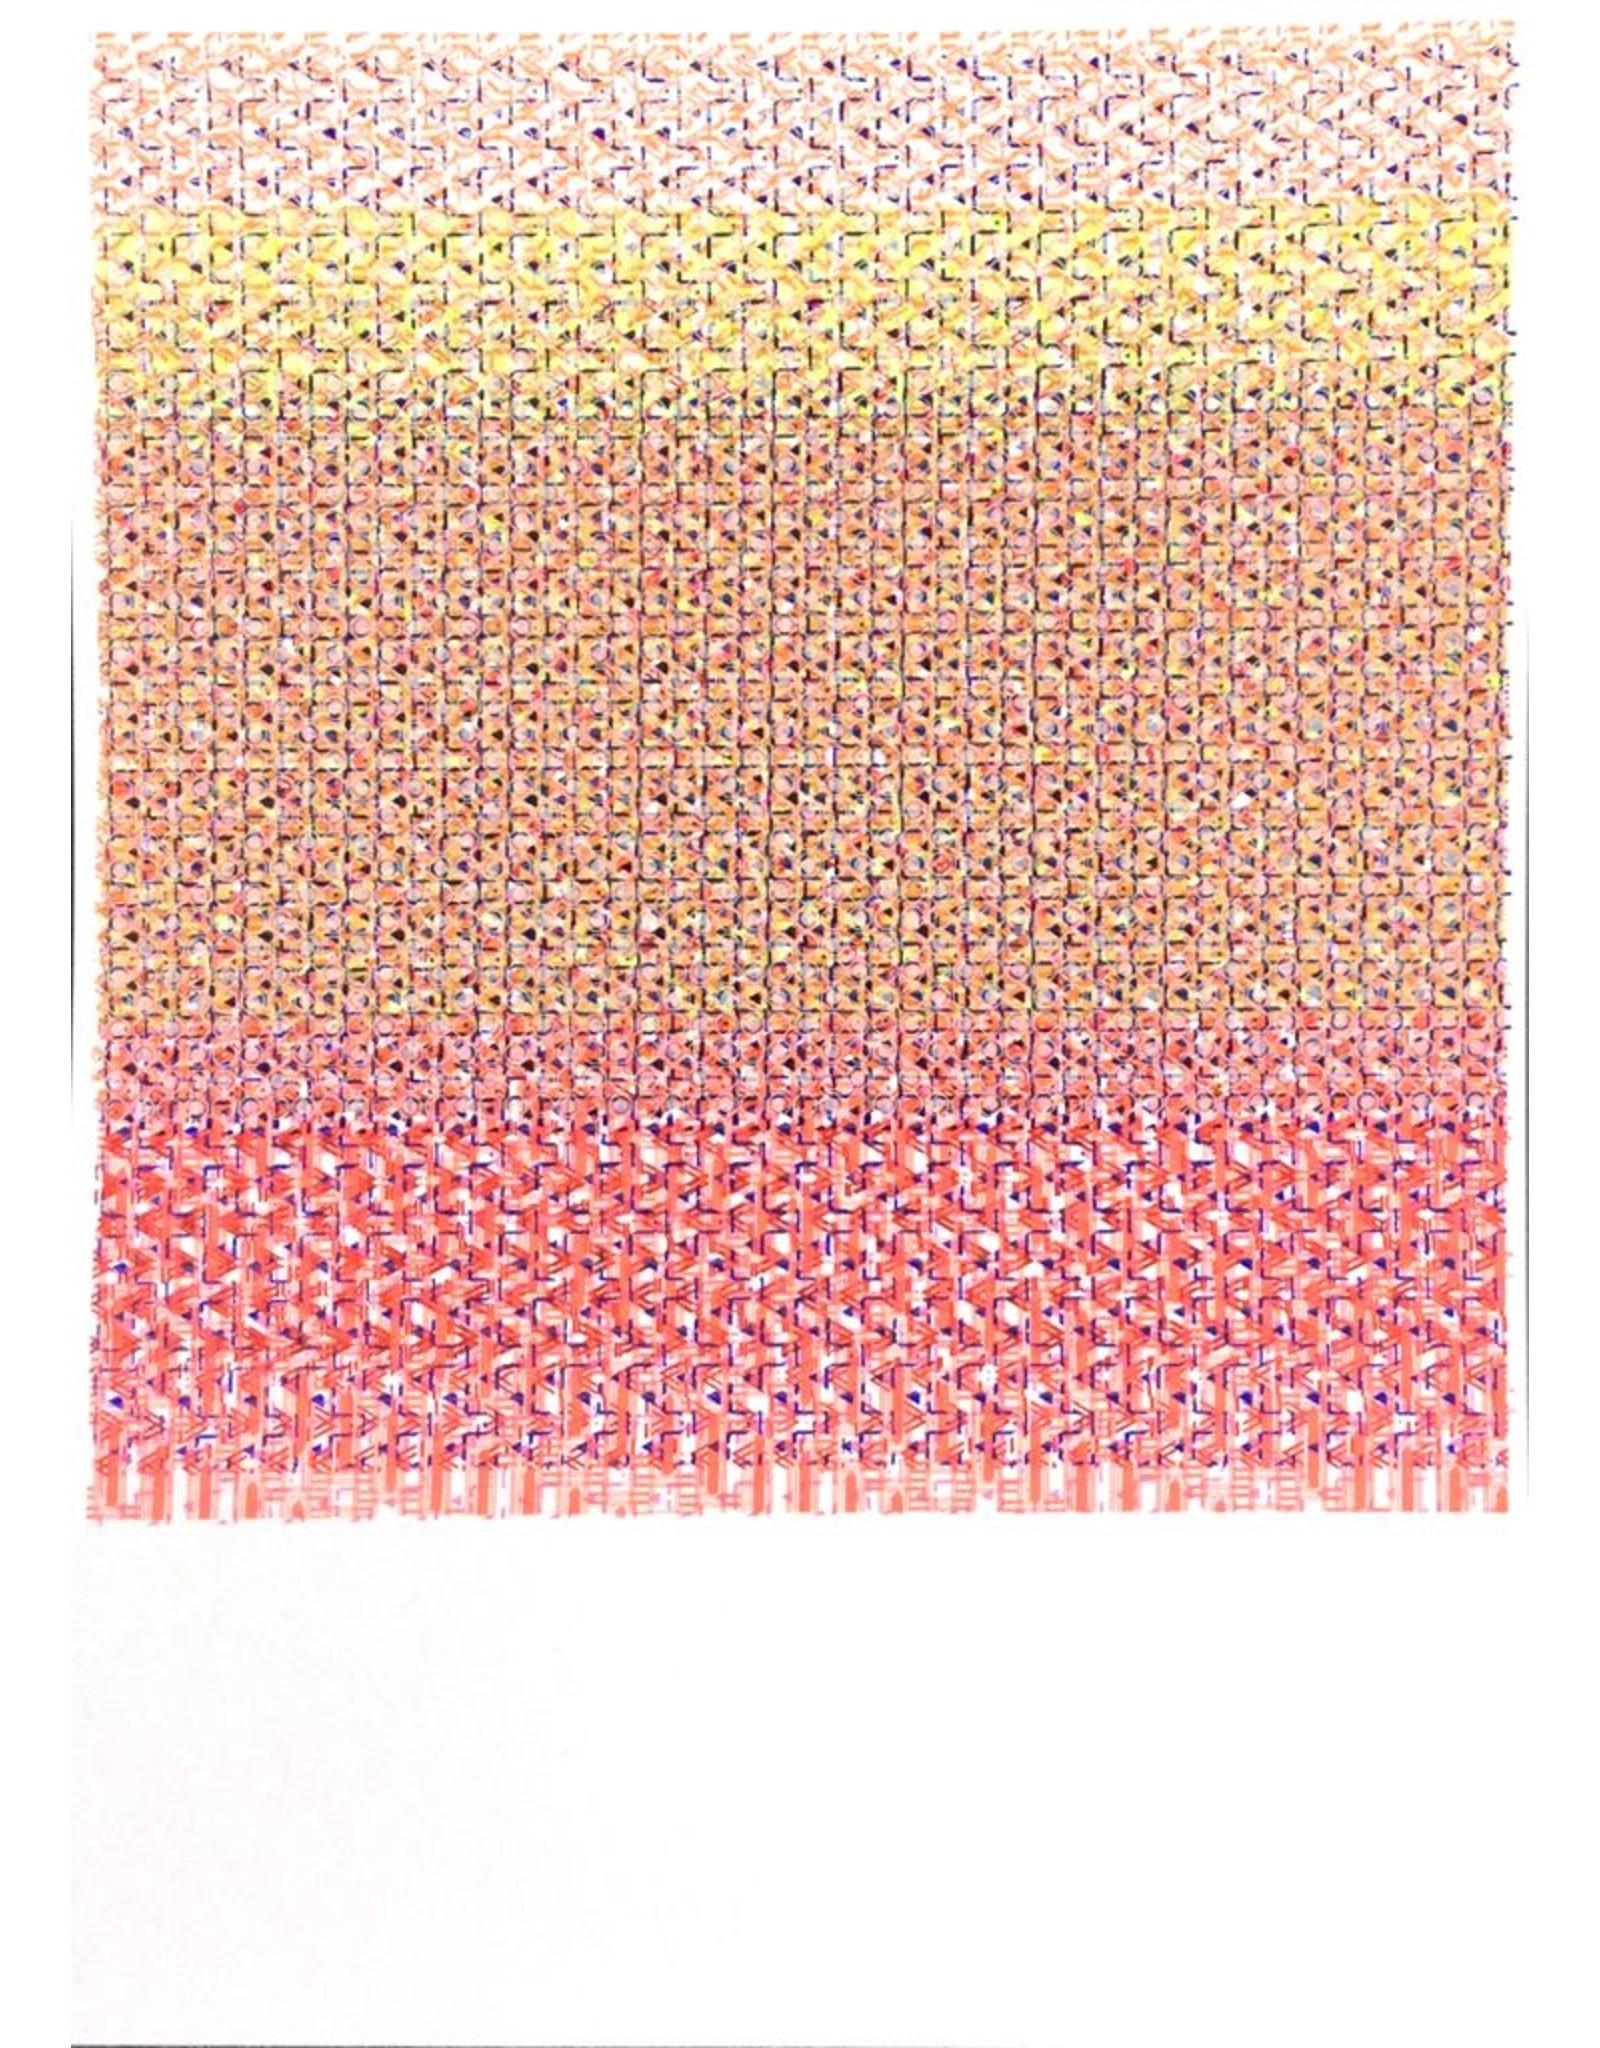 Pichon, Ilana Think: Monotype #043 (125)